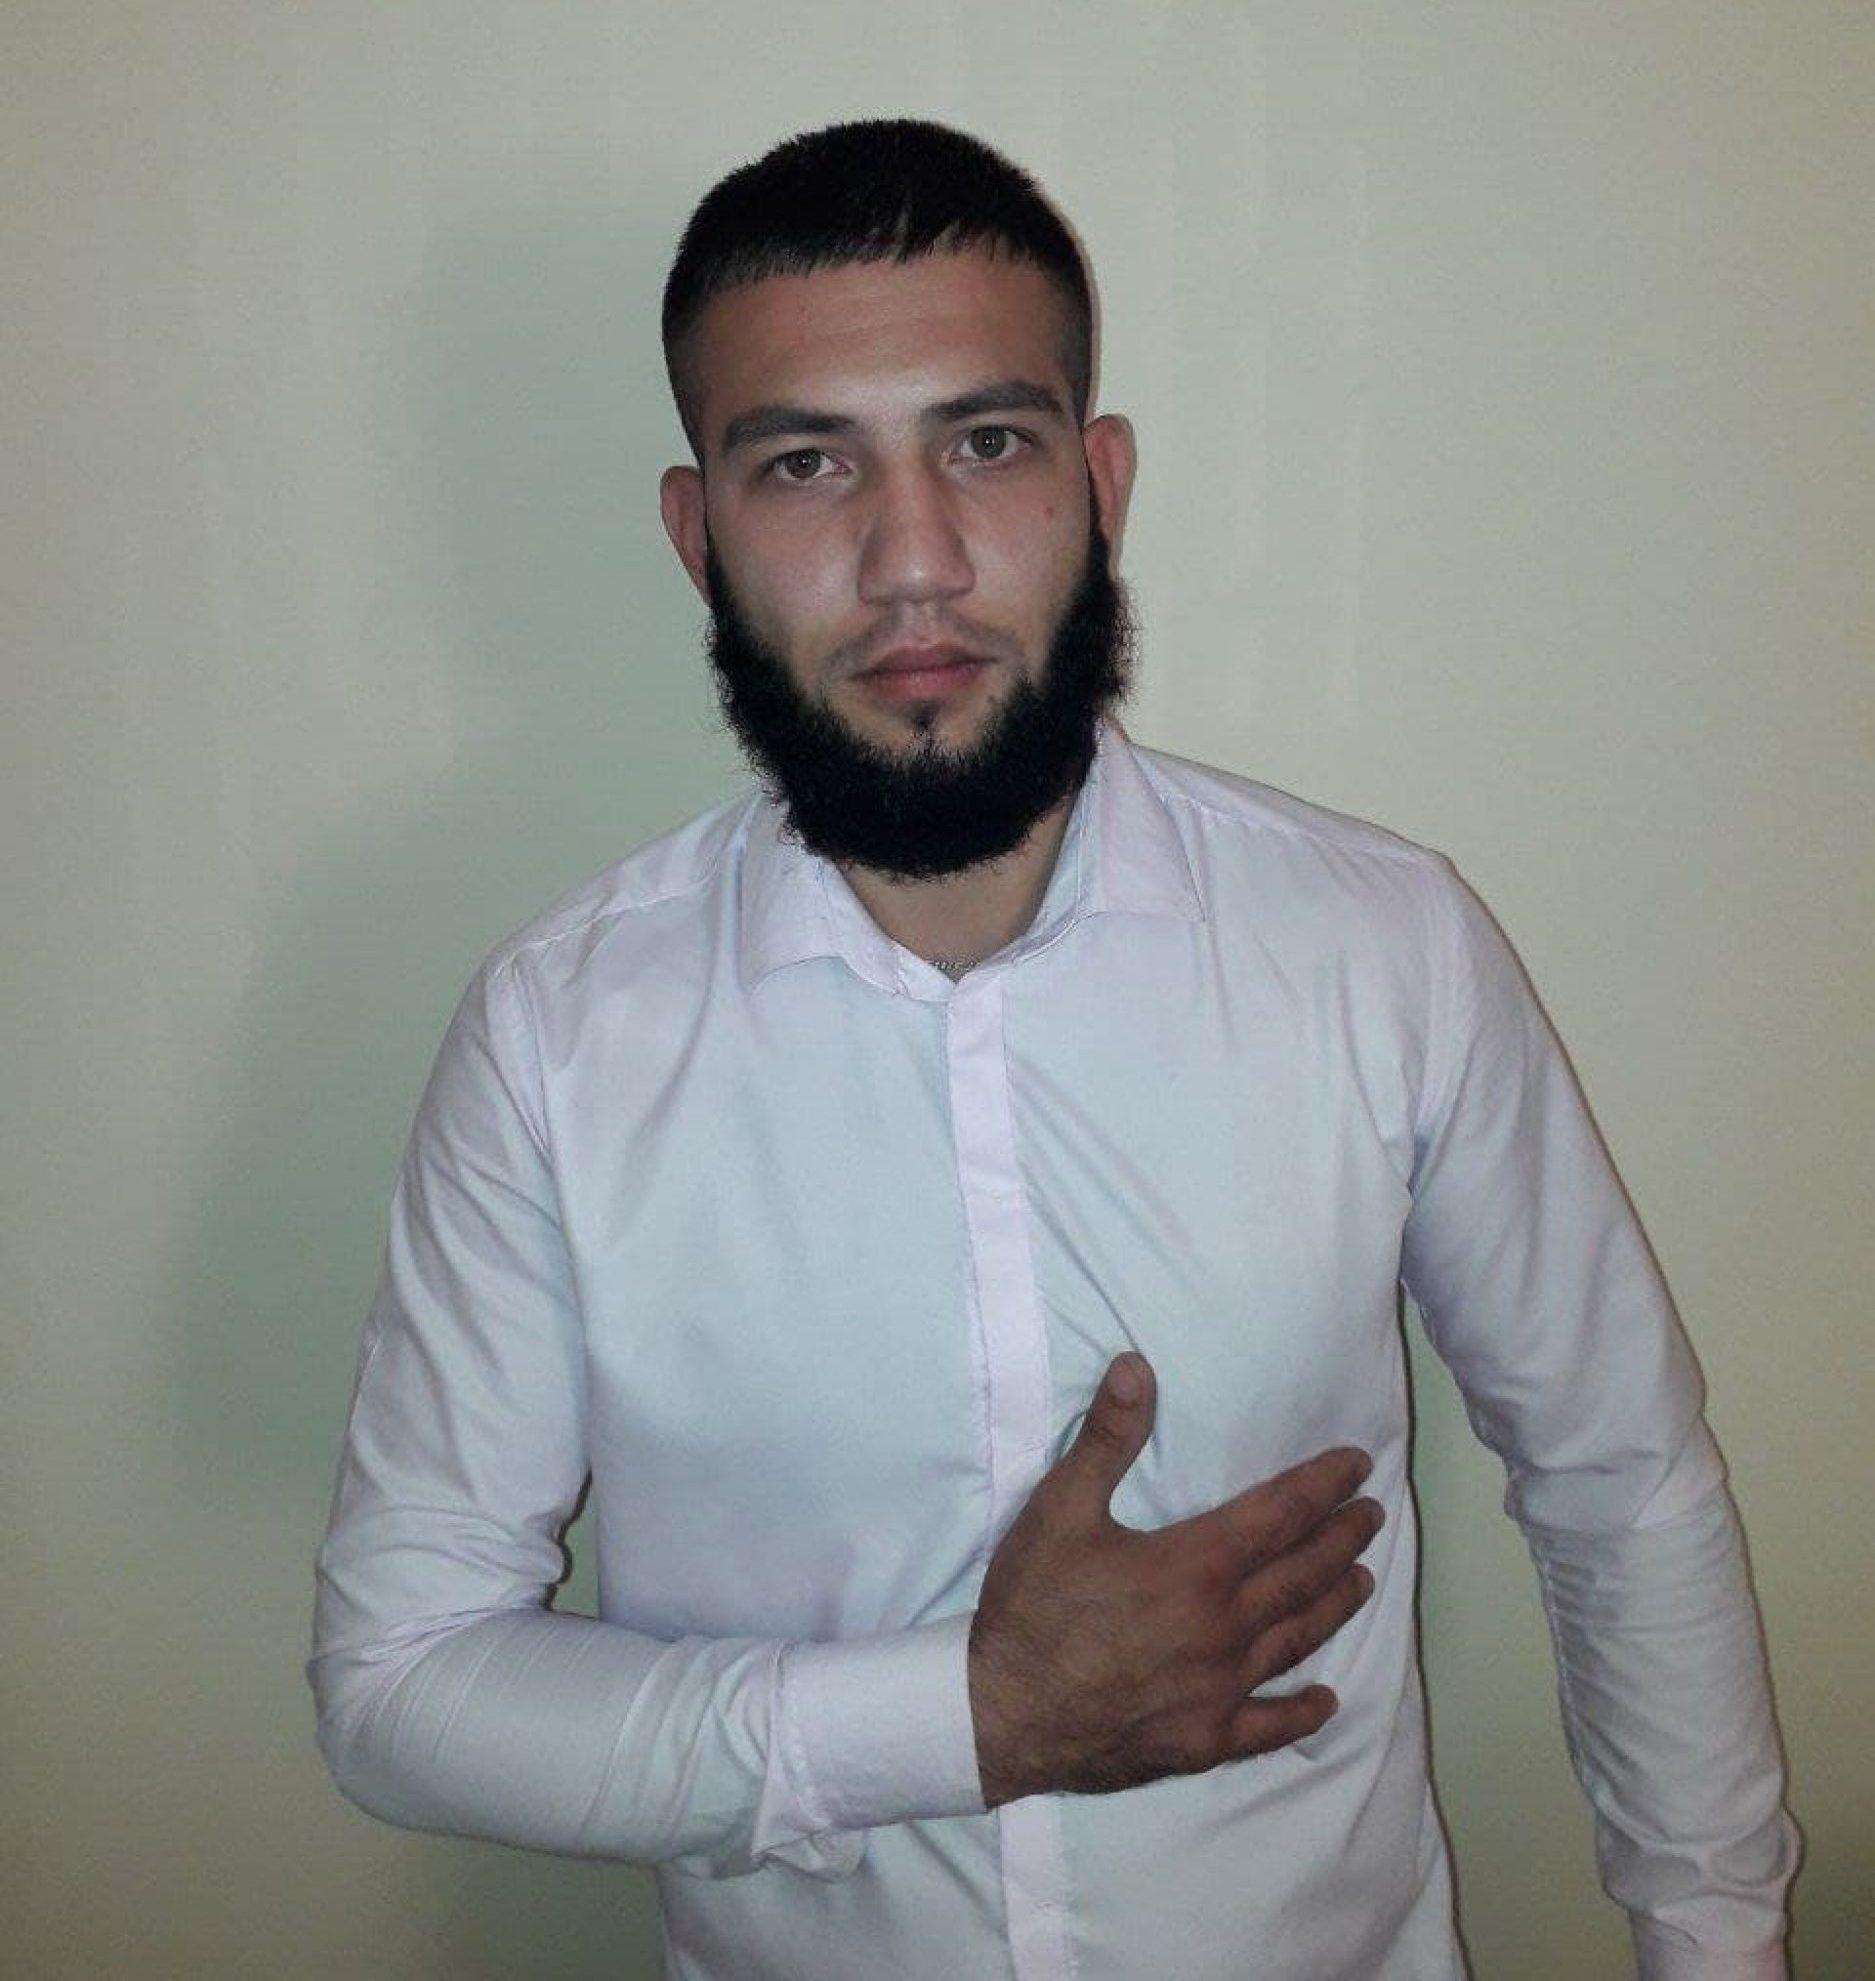 Узбекскому тиктокеру сбрили бороду и дали 15 суток